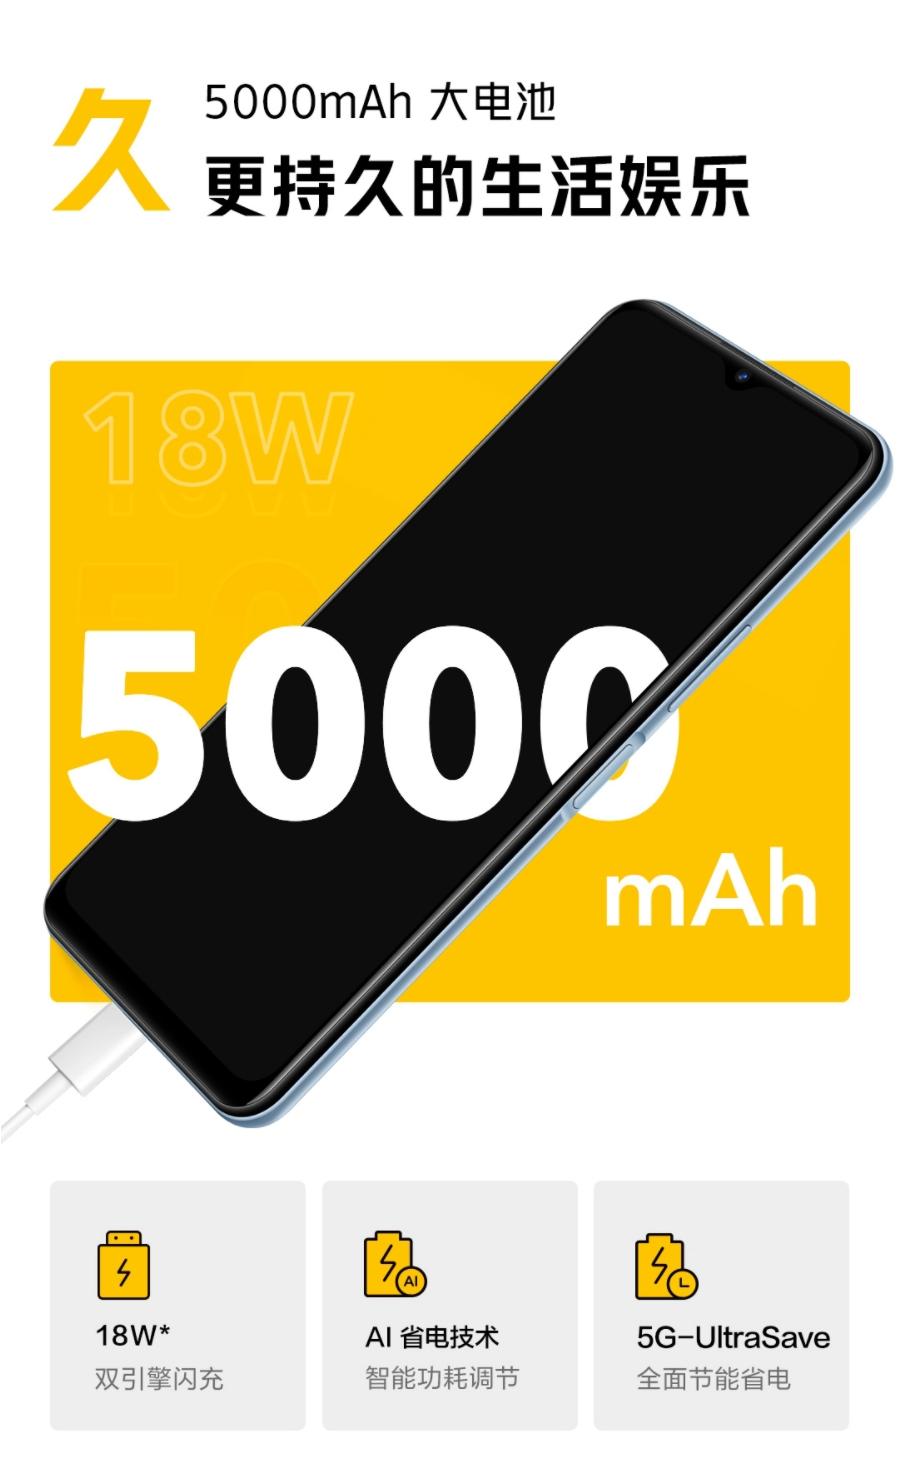 iQOO U3 上架,搭载天玑 800U + UFS 2.2,售价 1498 元 - 热点资讯 家电百科 第5张